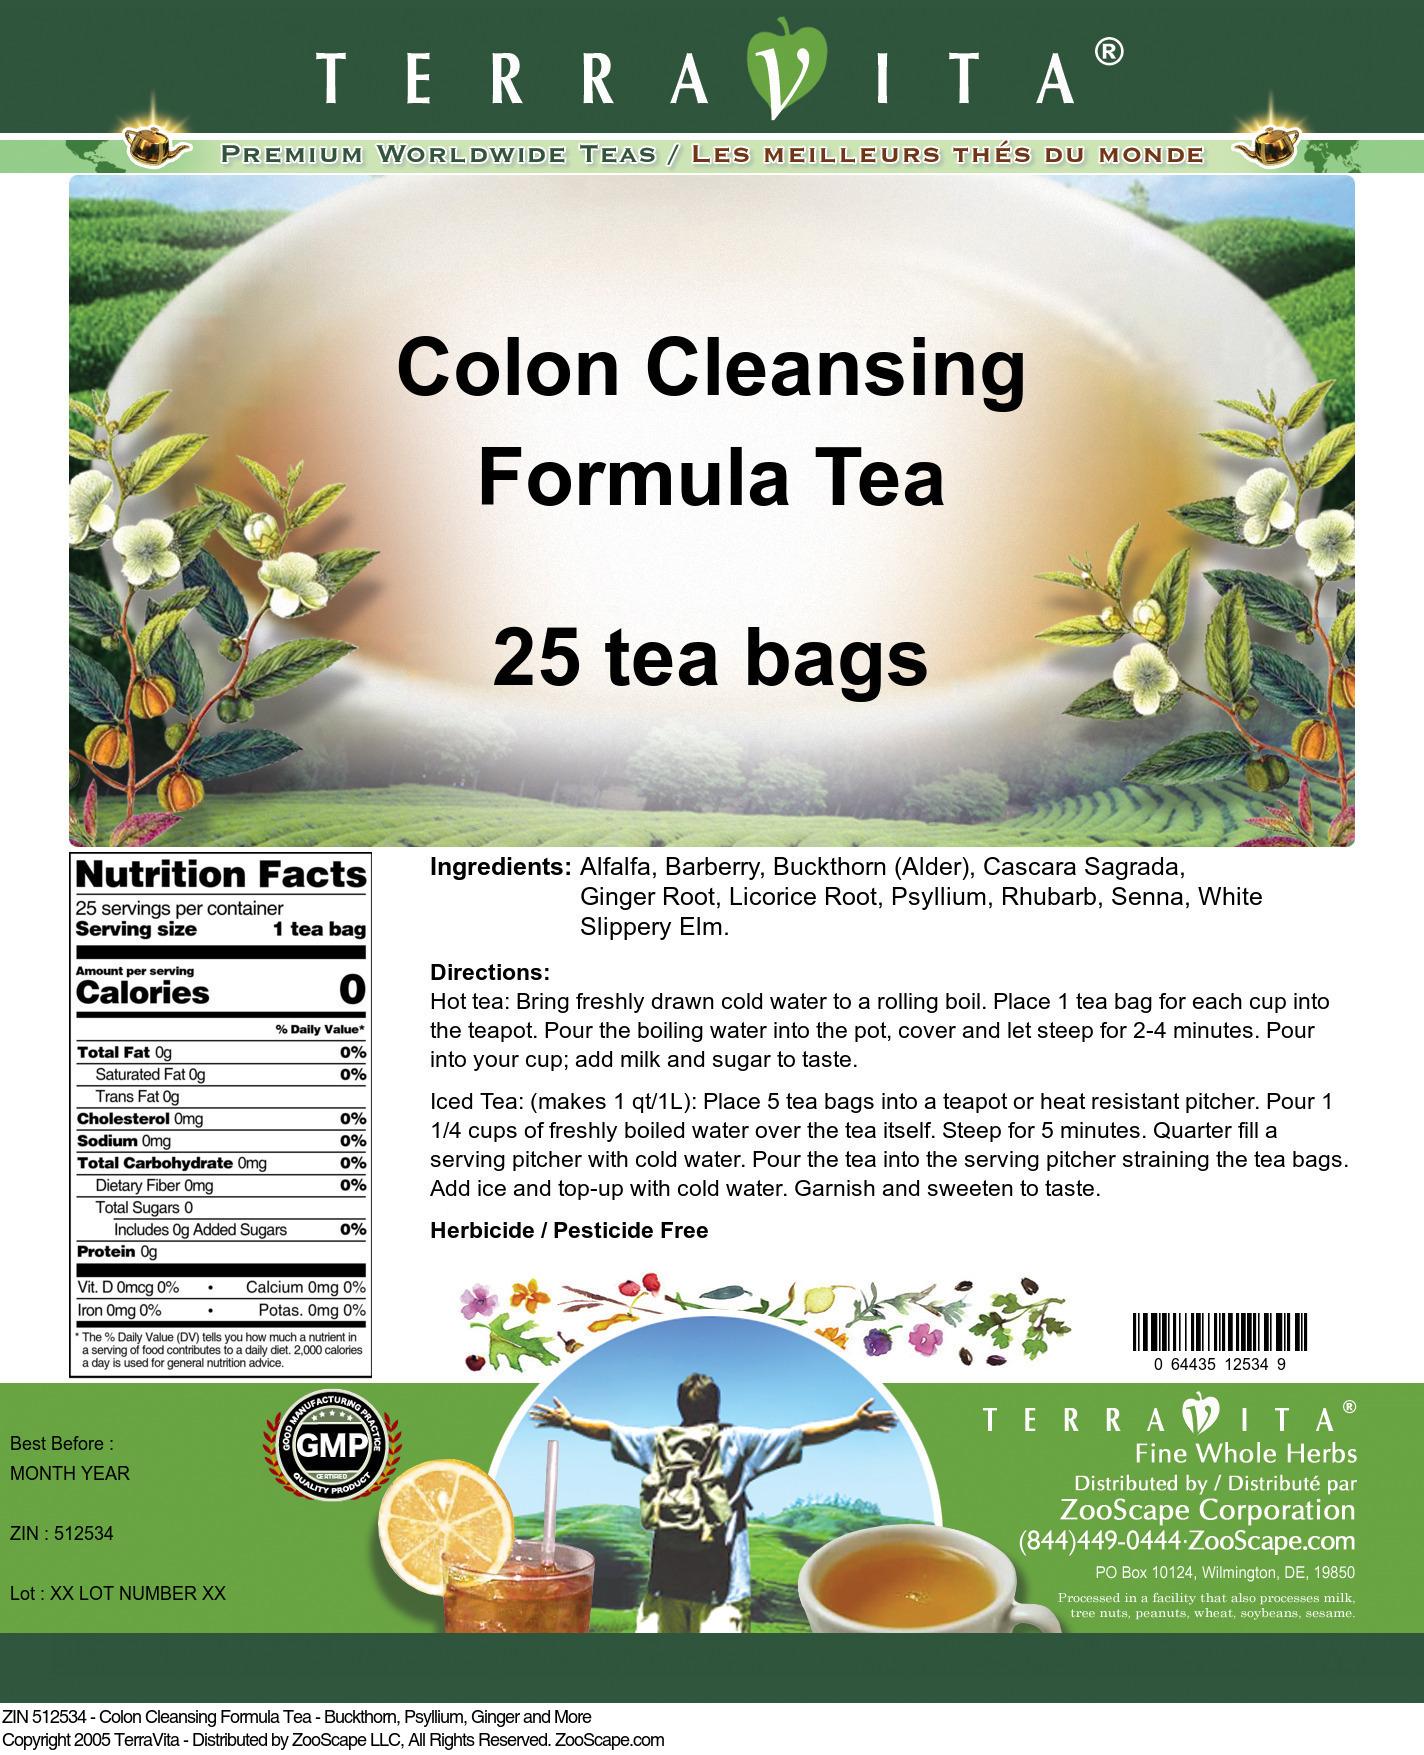 Colon Cleansing Formula Tea - Buckthorn, Psyllium, Ginger and More